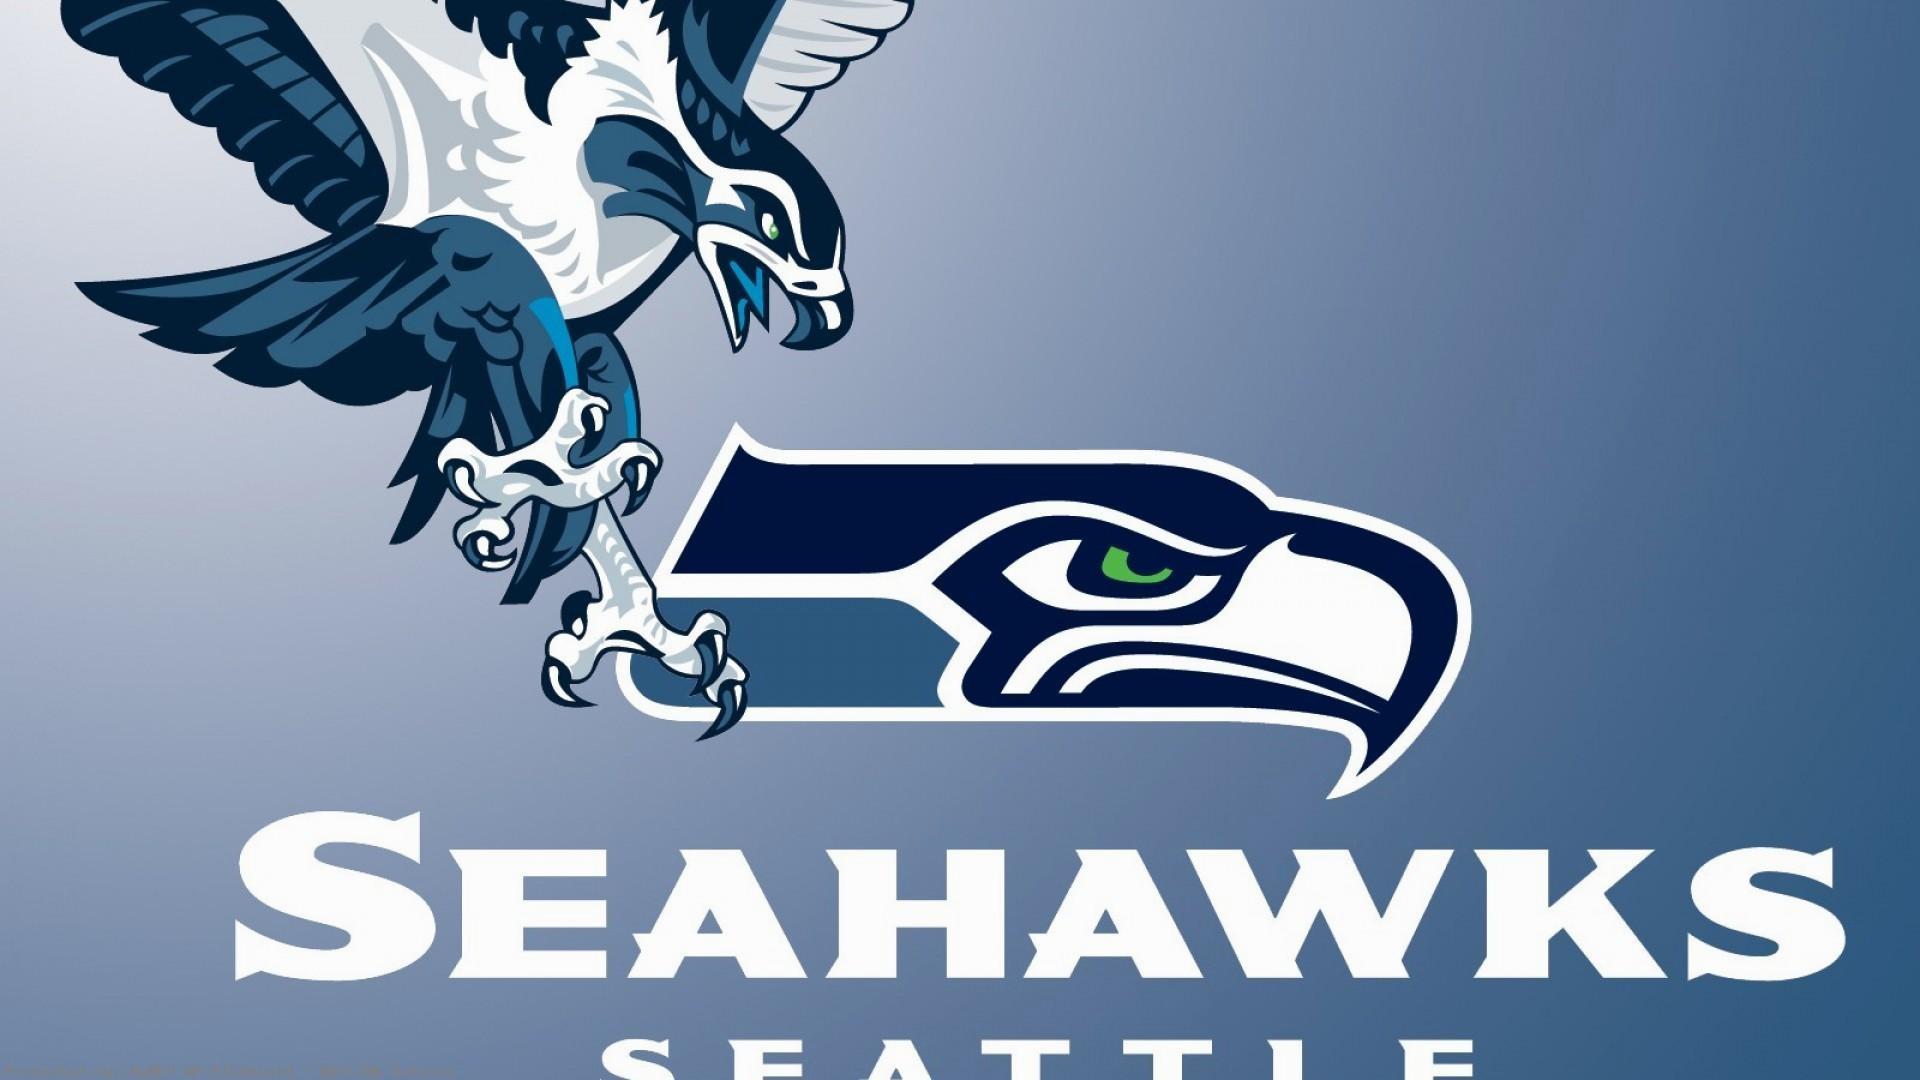 Seahawks-Logo-Super-Bowl-NFL-HD-1920%C3%